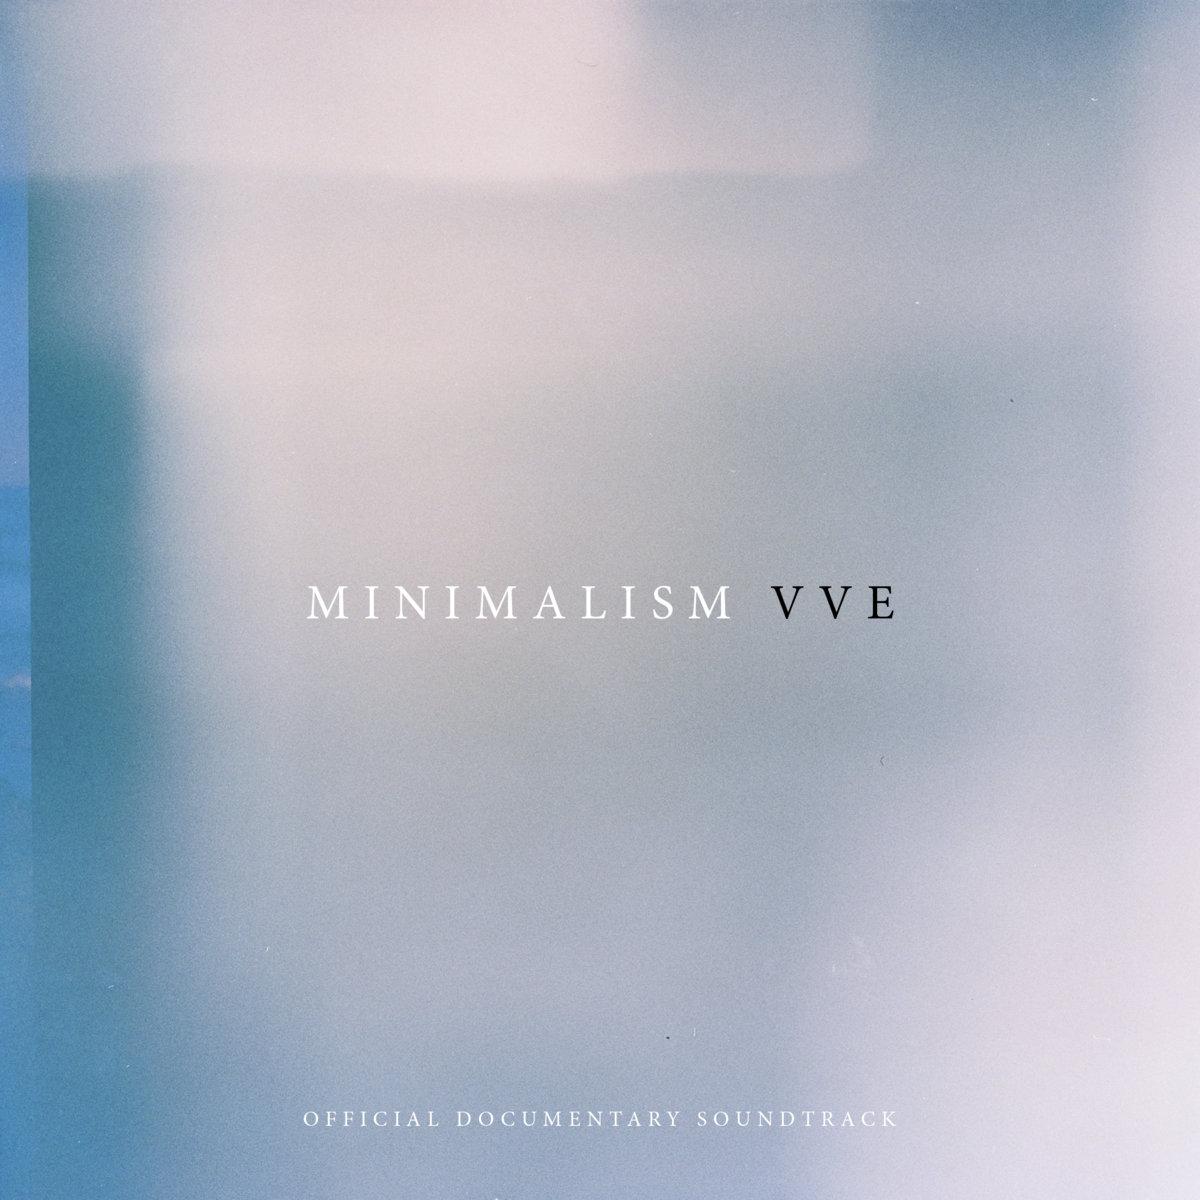 100 minimalism minimalism fashion stock photos for The minimalist